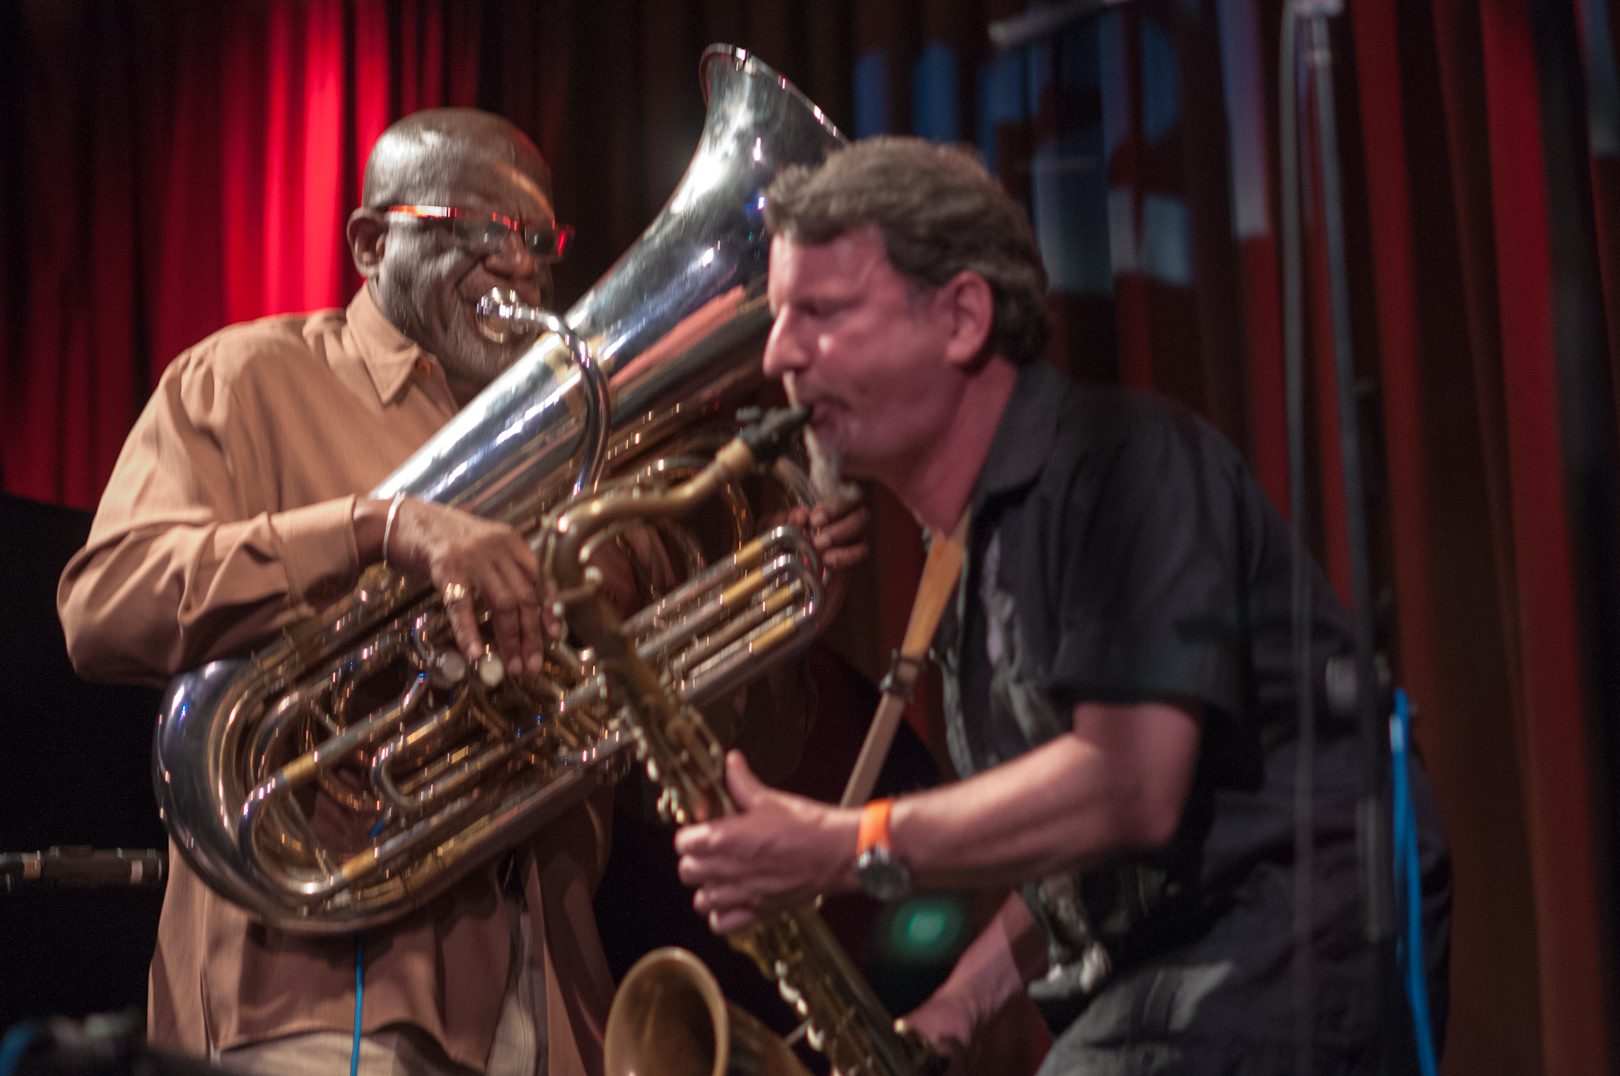 Bob Stewart and Jeff Lederer at the Undead Music Festival